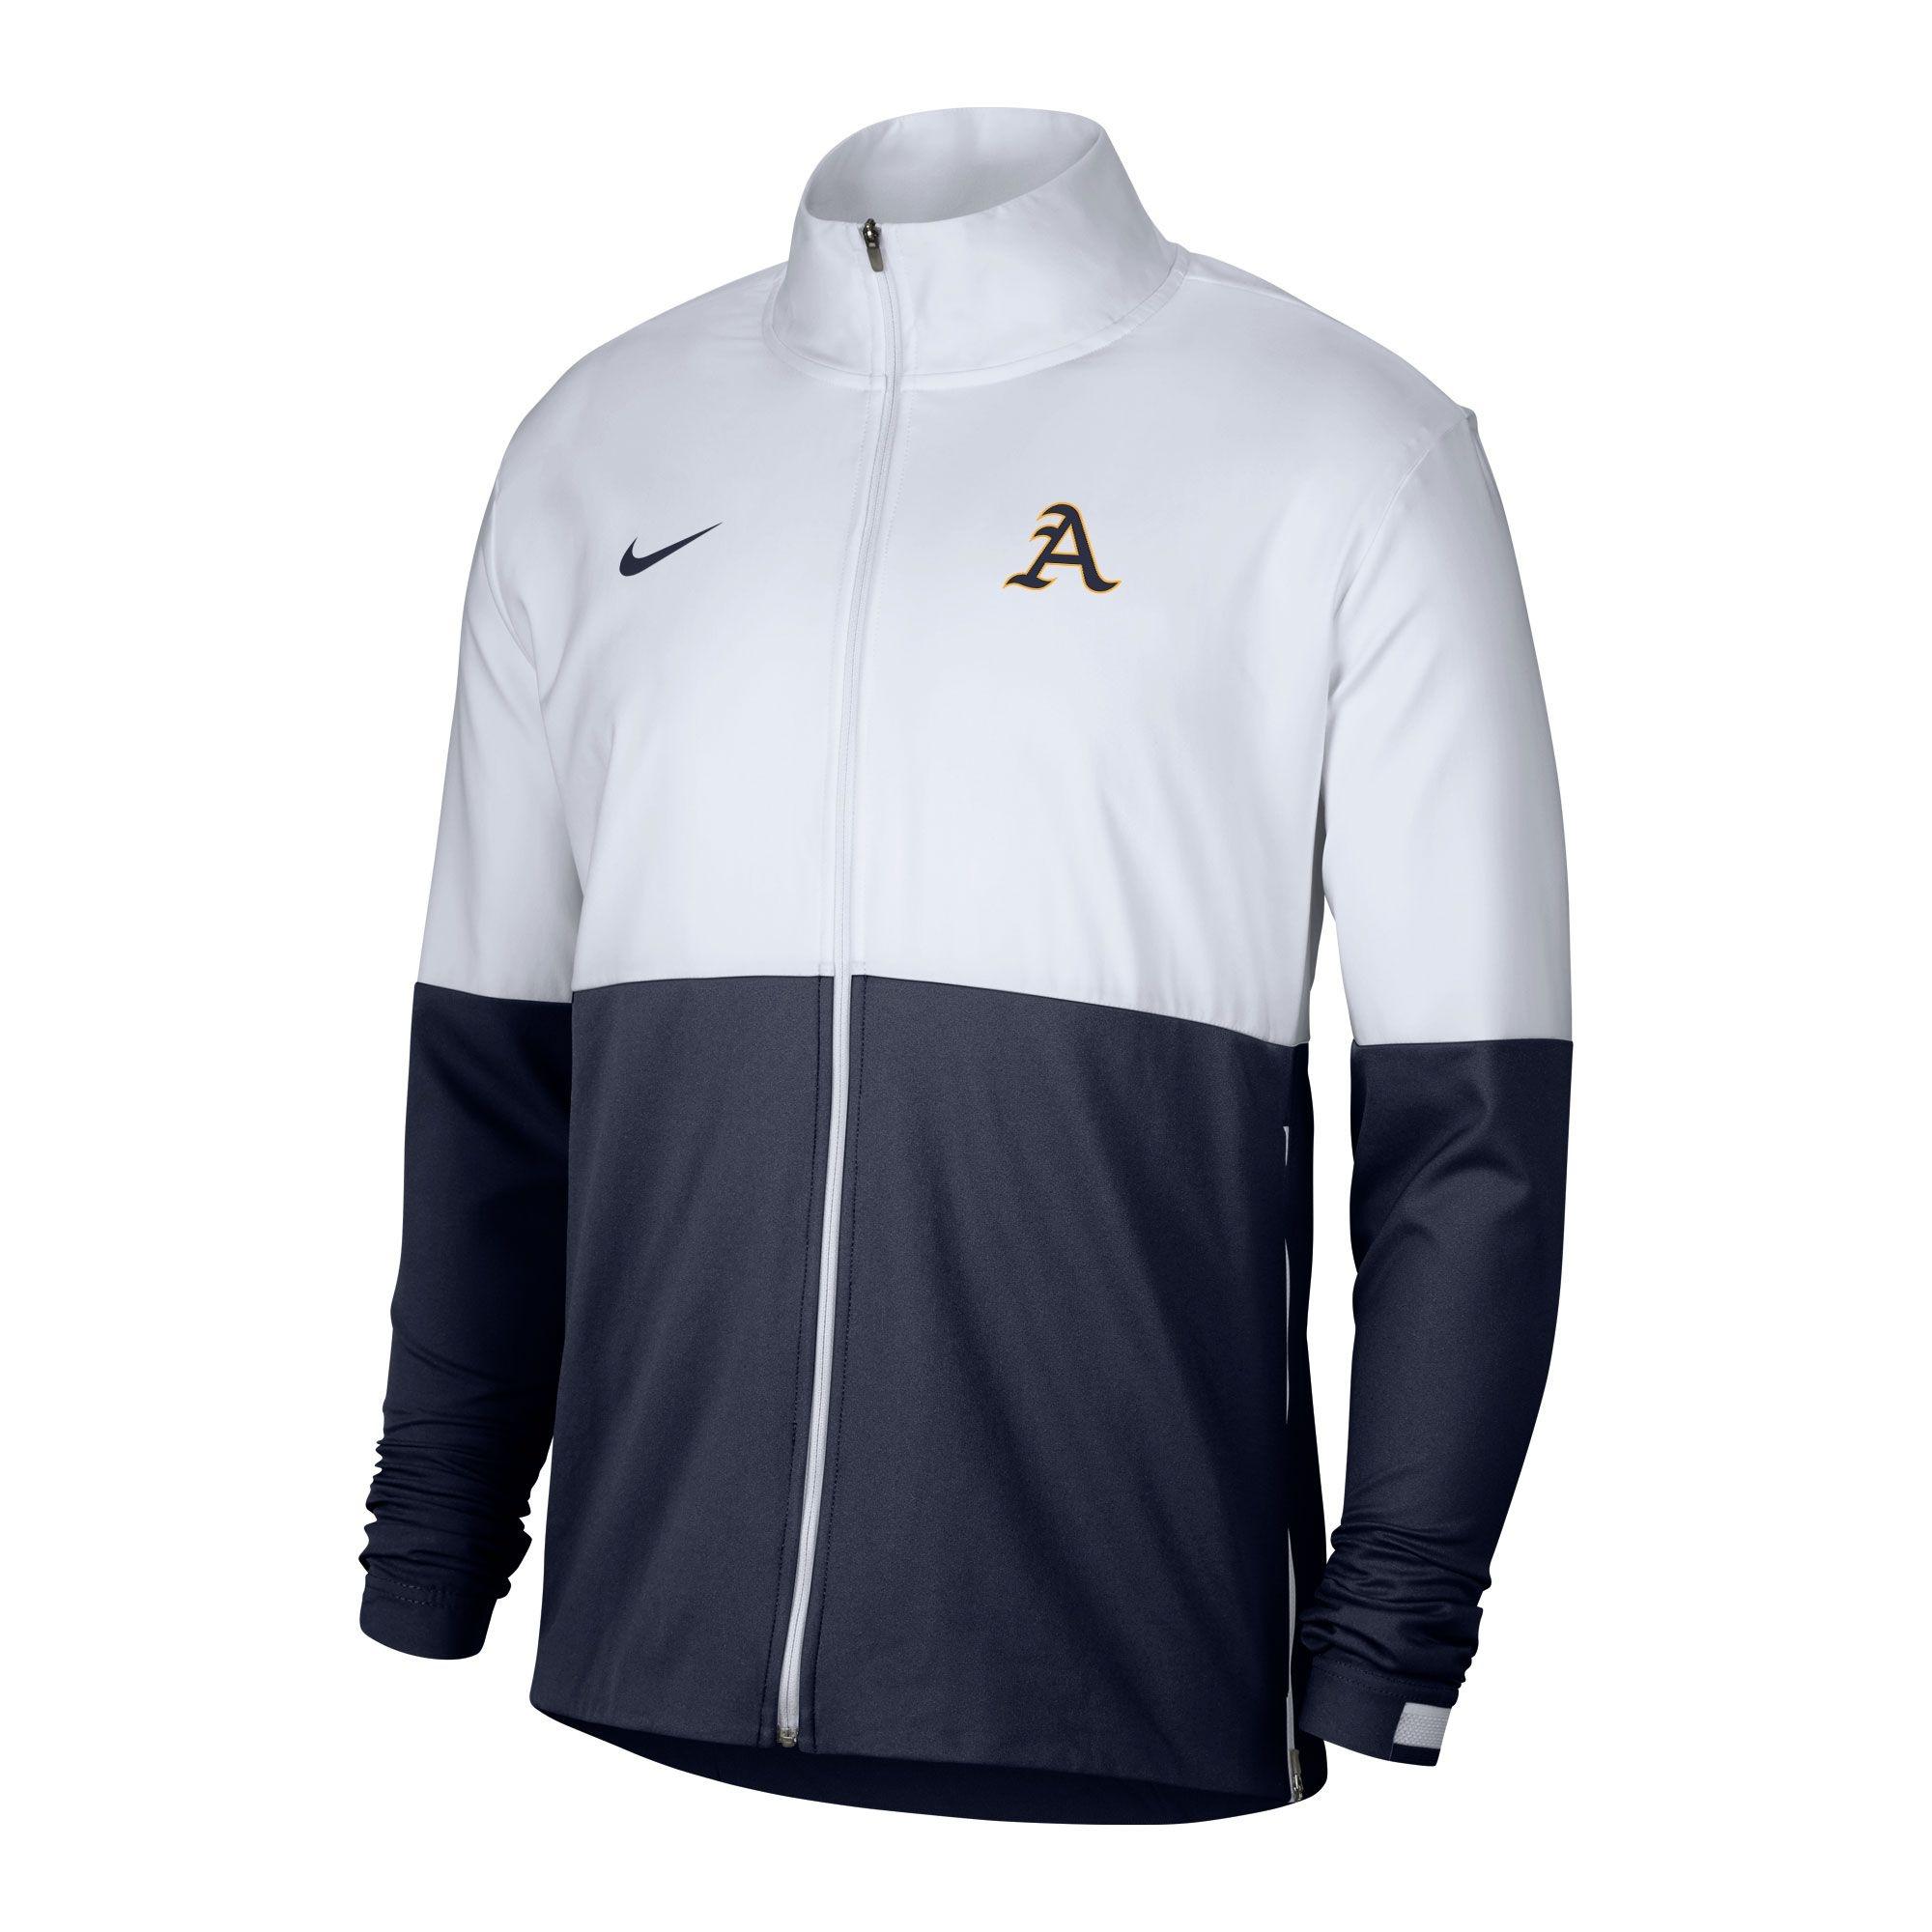 Nike Woven Travel Full Zip Jacket